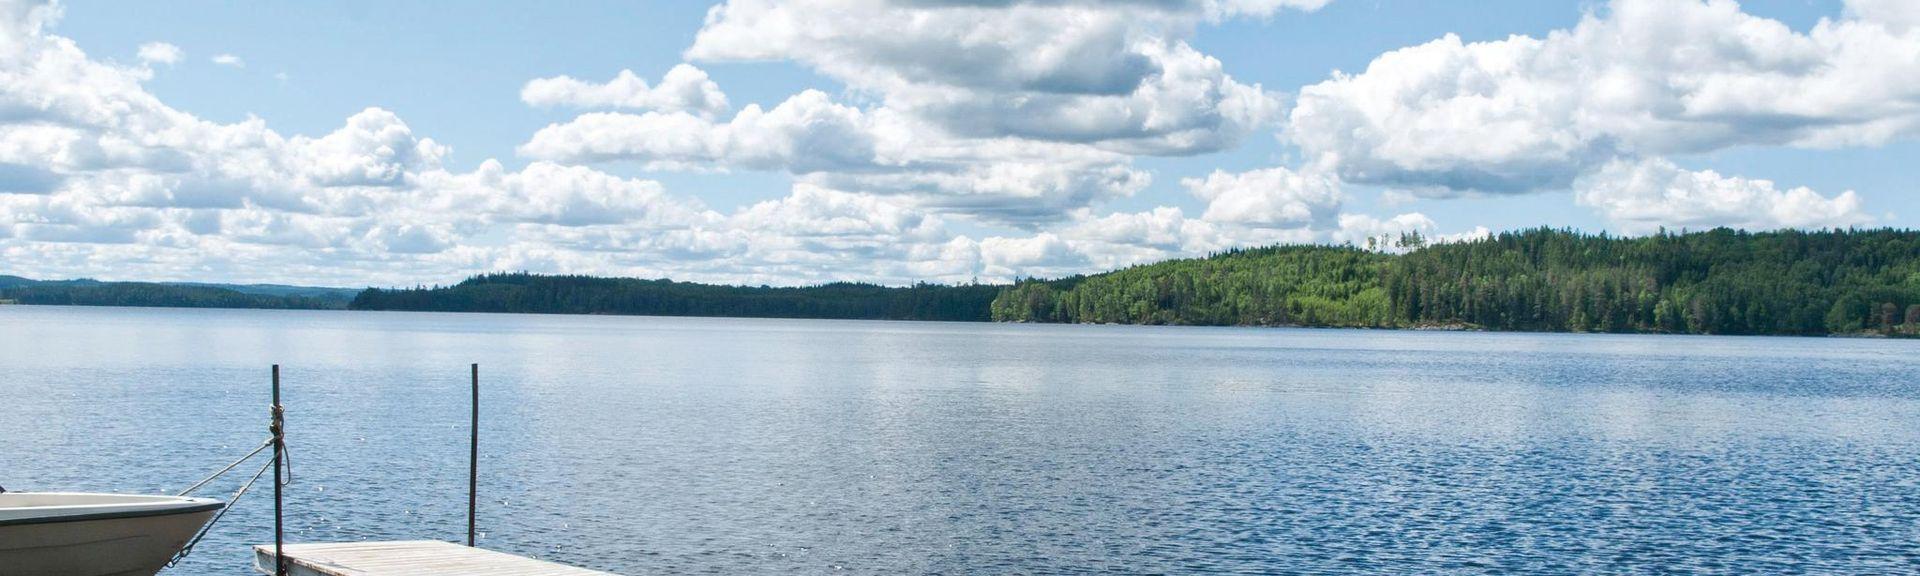 Alingsas, Vastra Gotaland County, Sweden